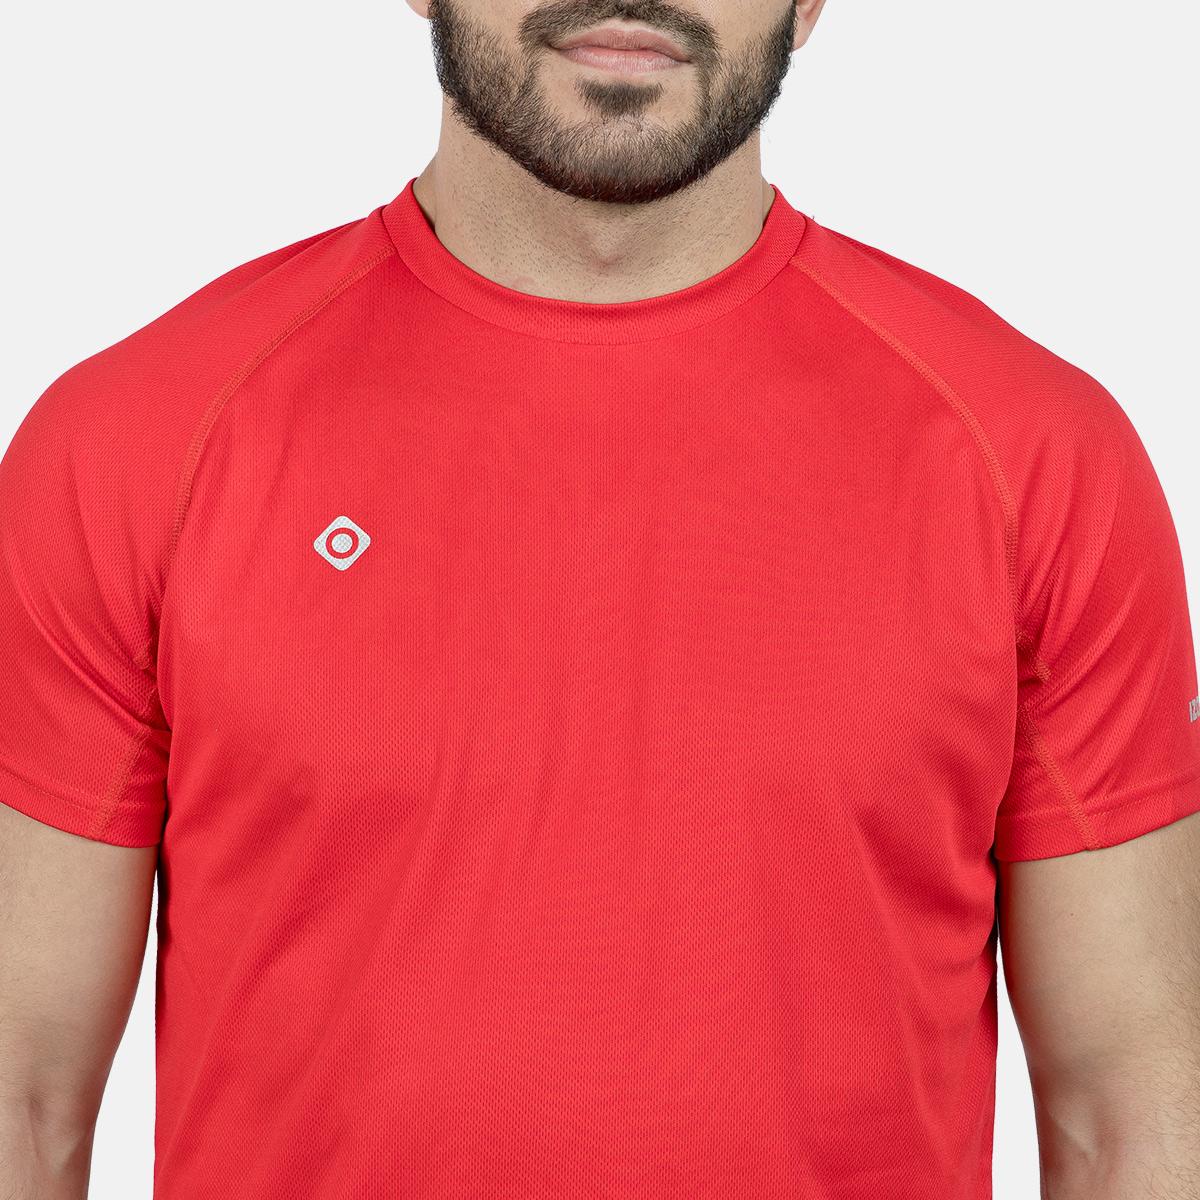 MAN'S CREUS II T-SHIRT RED